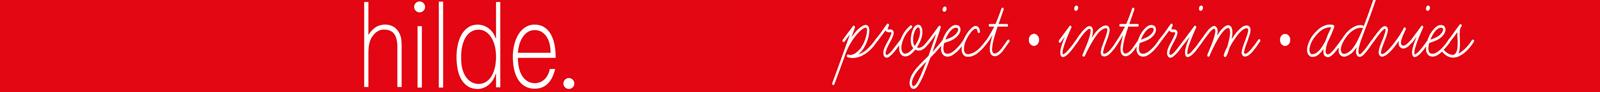 Logo-horizontaal-rood-hilde-pietersma